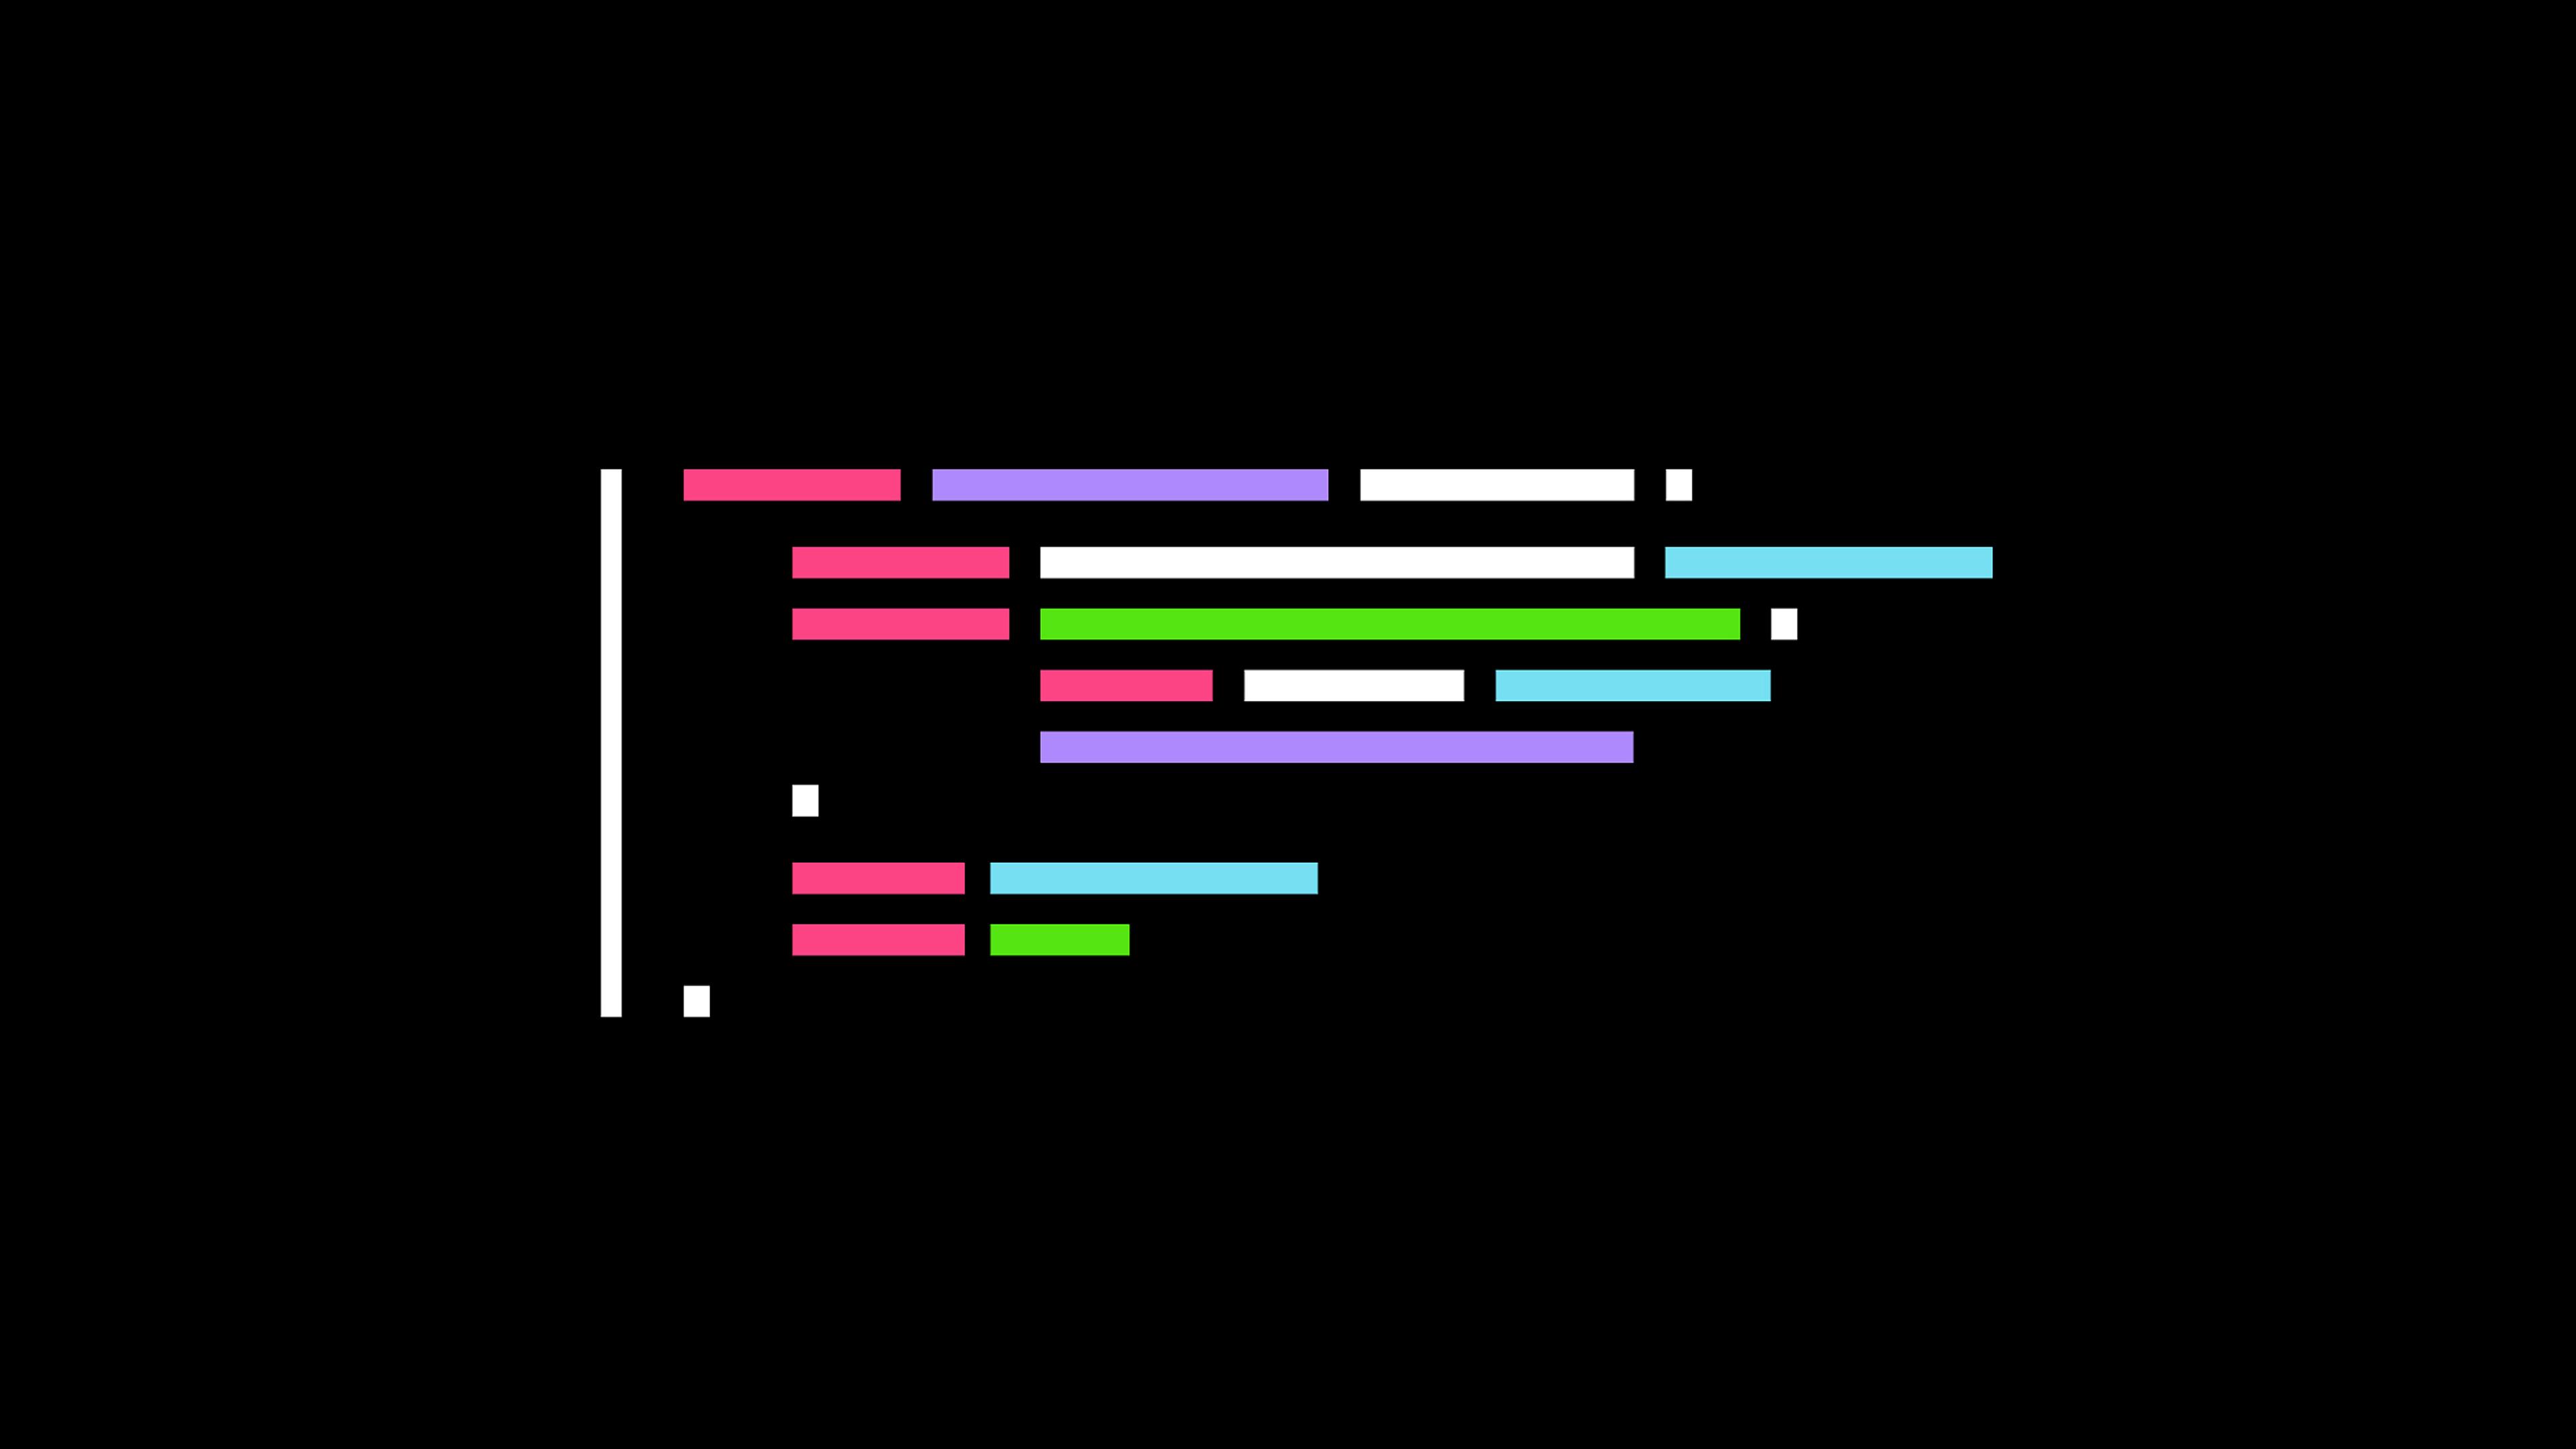 Morgan Codes 4k Wallpaper In 2020 Code Wallpaper Coding Wallpaper